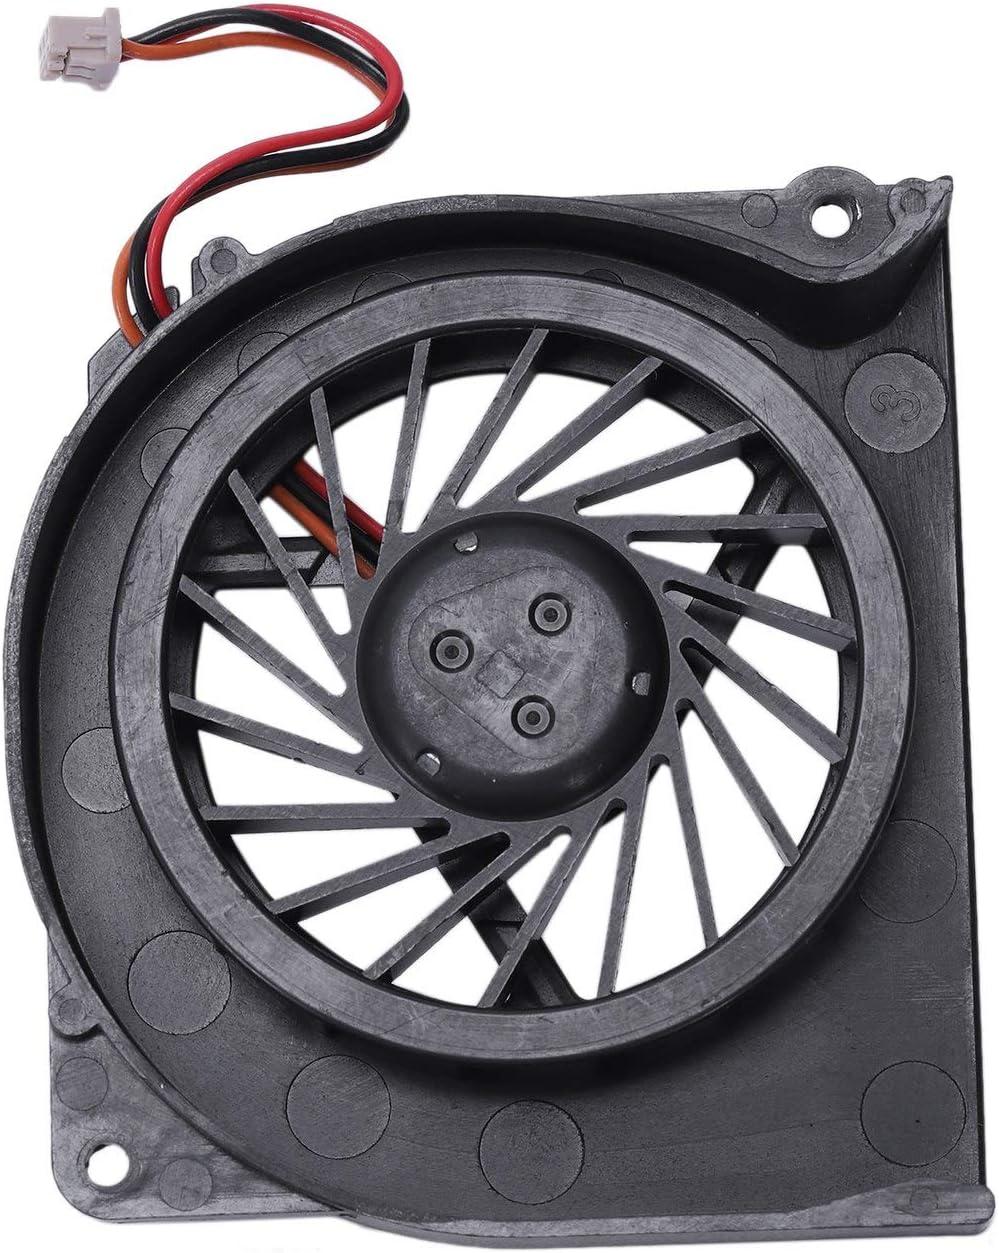 Noblik Laptop CPU Cooling Fan for Fujitsu Lifebook S6311 S2210 S6510 S6410 E8410 S7110 T4215 T5500 T2050 Mcf-S6055Am05B Notebook Cooler Radiator